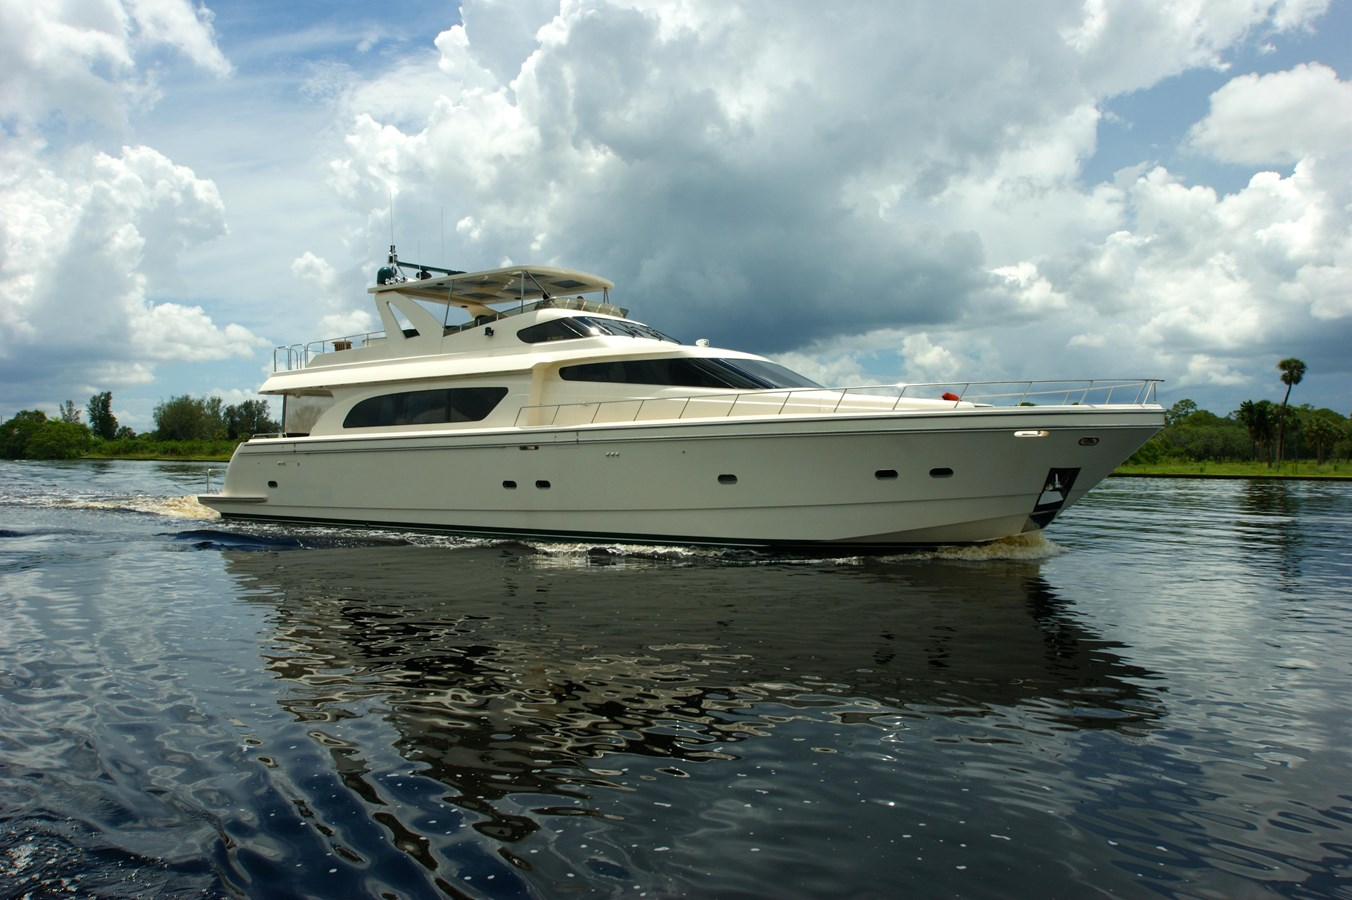 LORI ANN yacht for sale